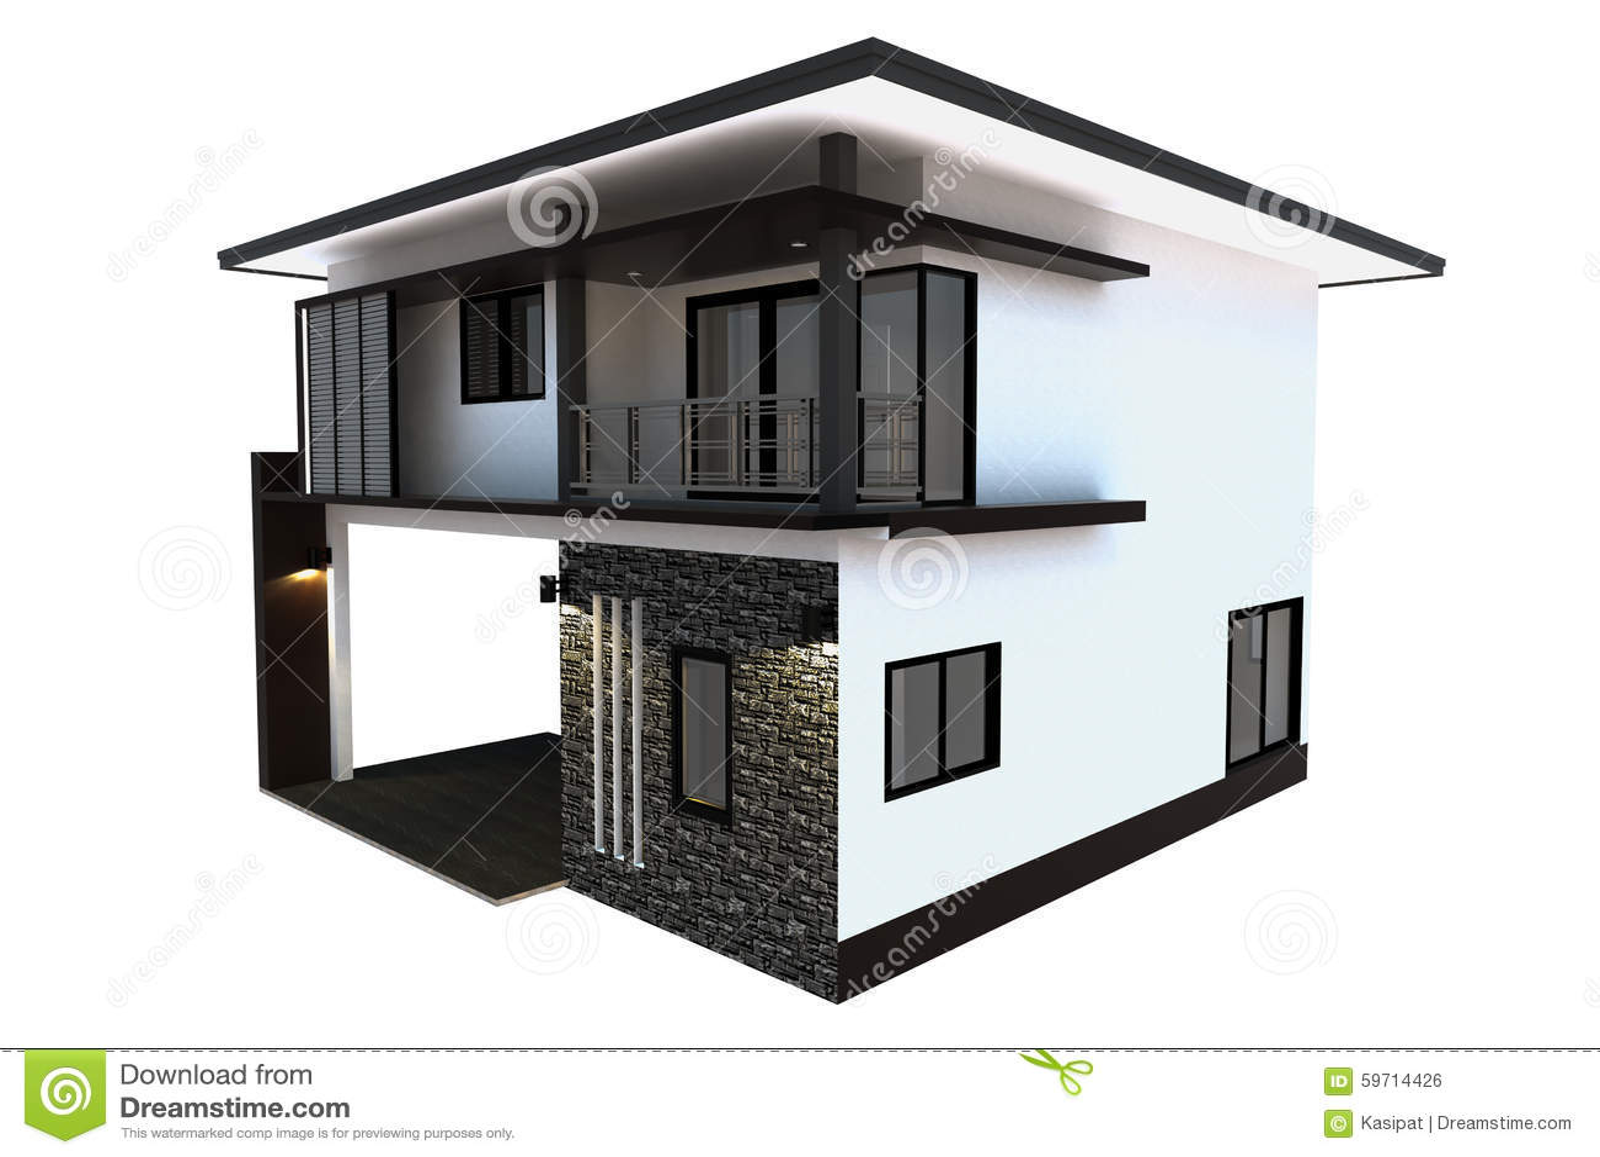 3d home design stock illustration image 59714426 home design large home house design bc royalty free stock